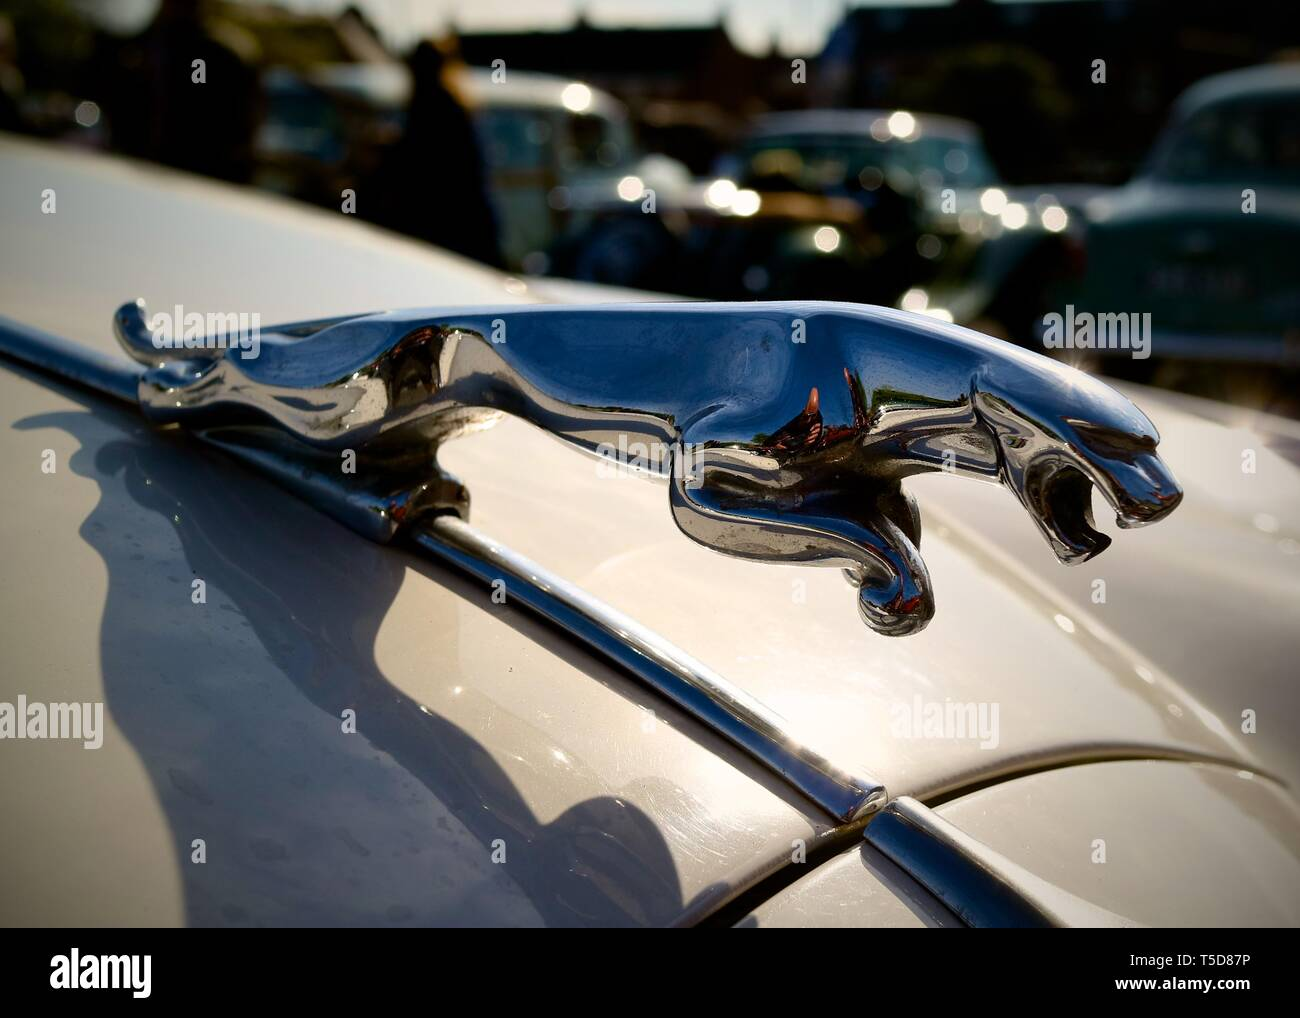 A leaping jaguar on the bonnet of a Jaguar Motor Car - Stock Image